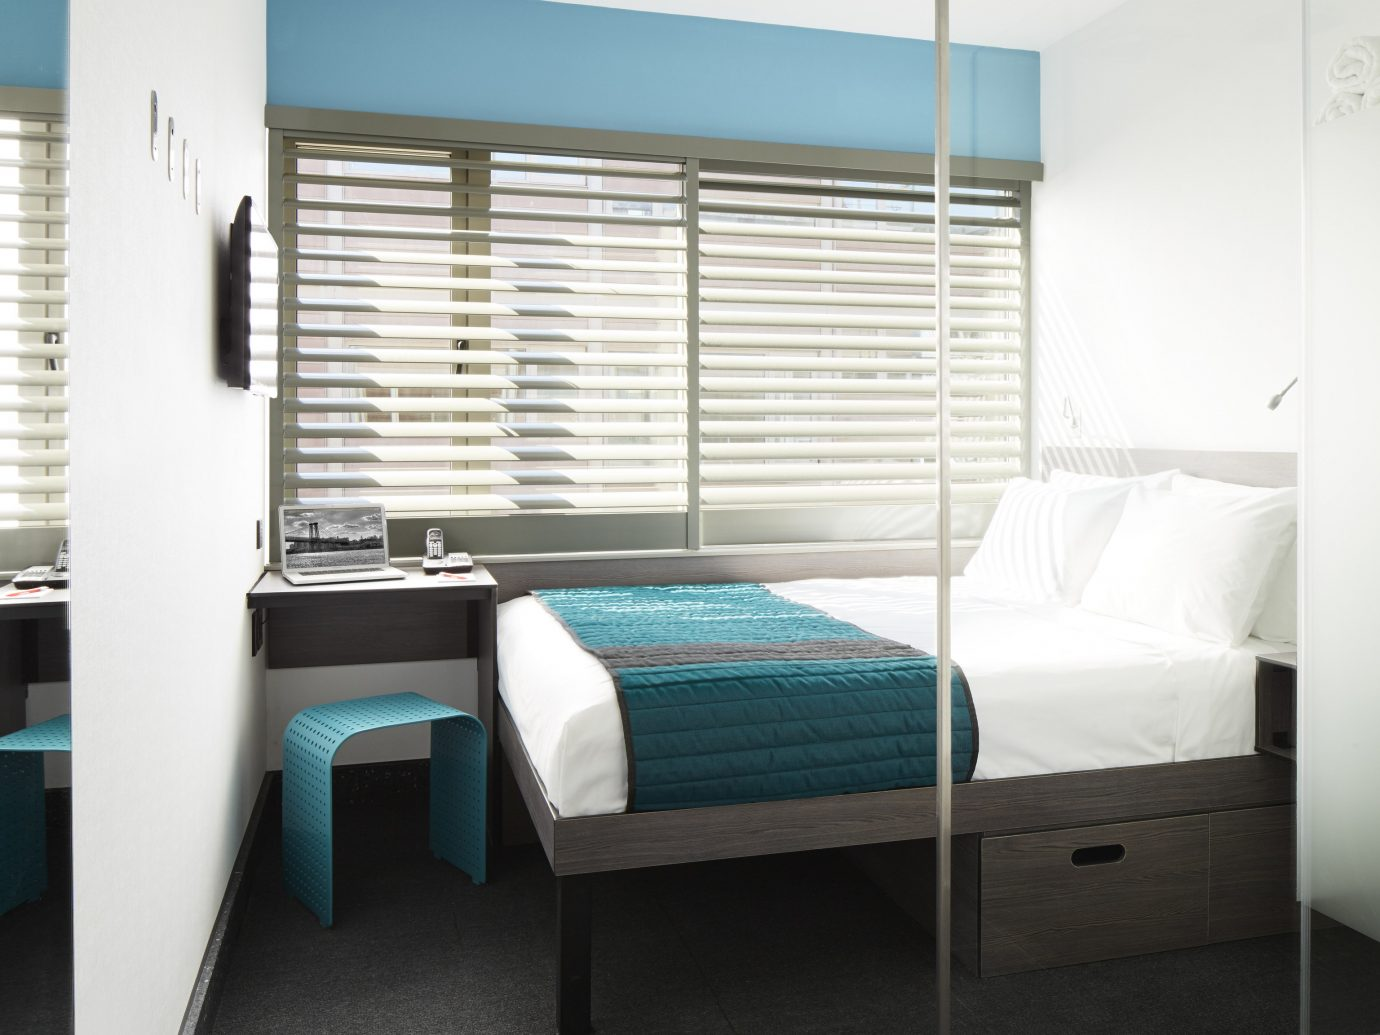 Hotels floor indoor wall room bed property window furniture interior design Bedroom window covering condominium Design real estate apartment Suite window treatment area